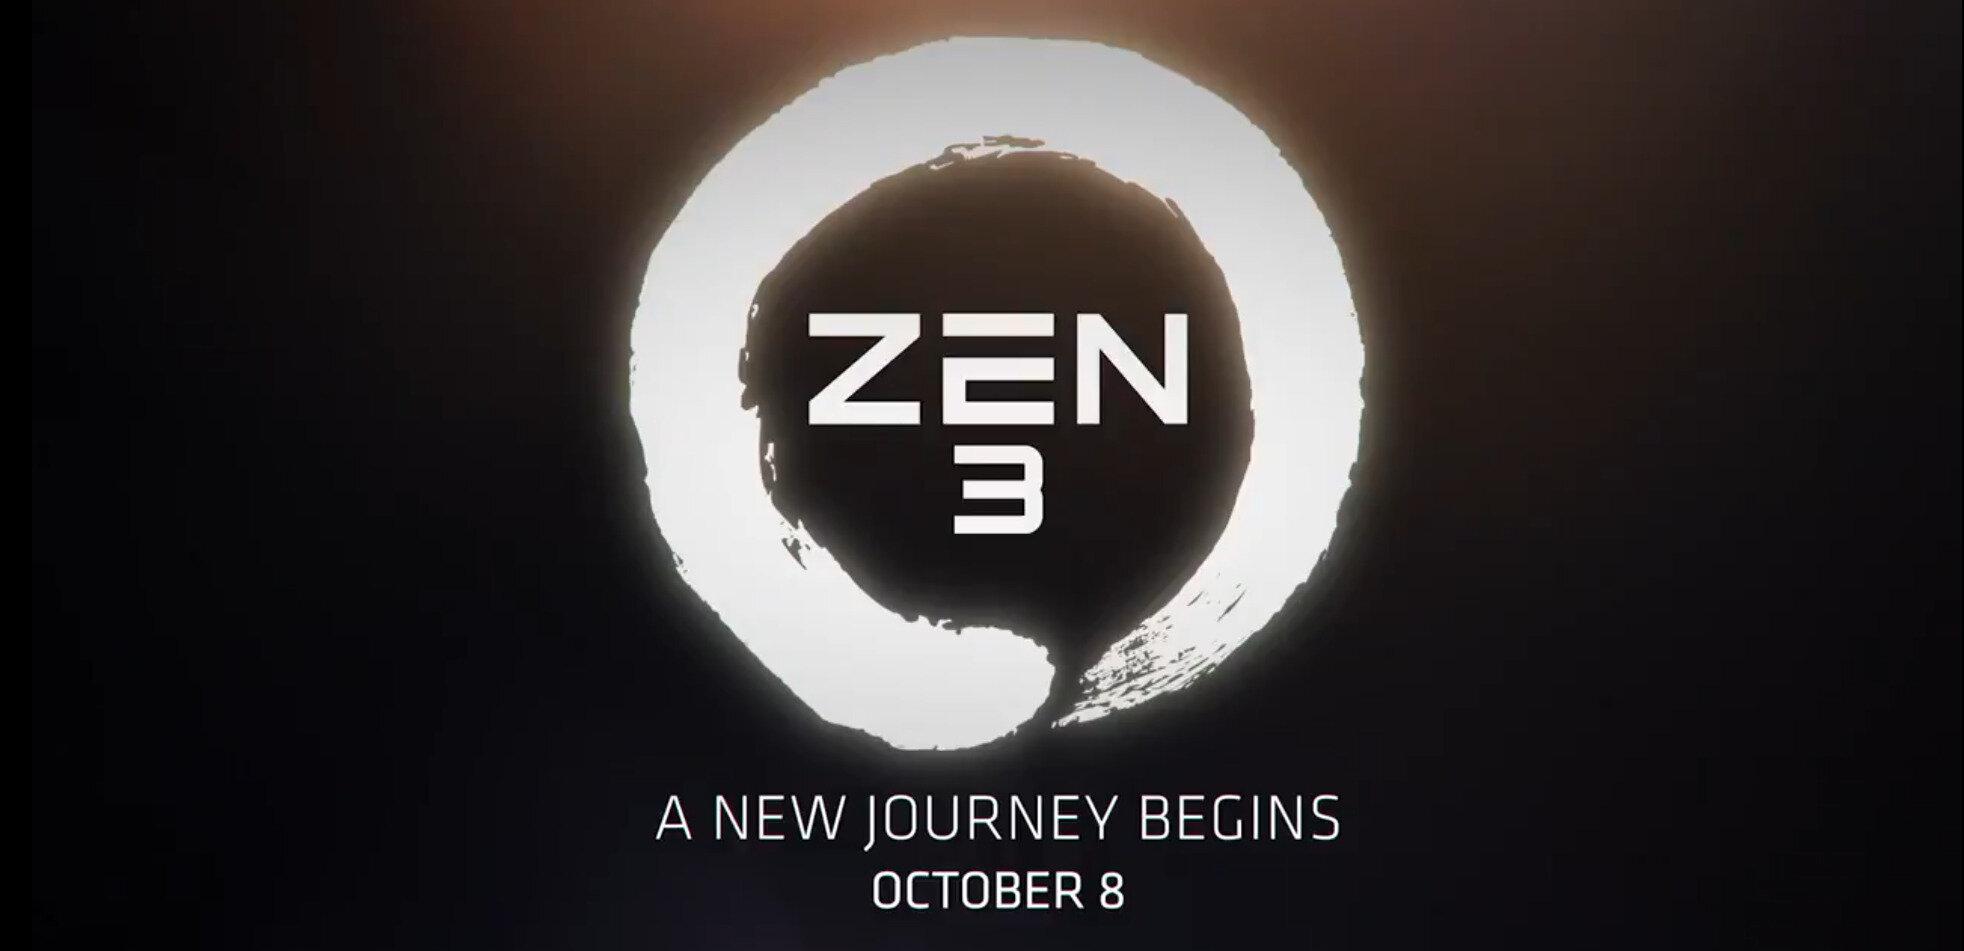 AMD annoncera Zen 3 le 8 octobre, les Radeon RX 6000 le 28 octobre